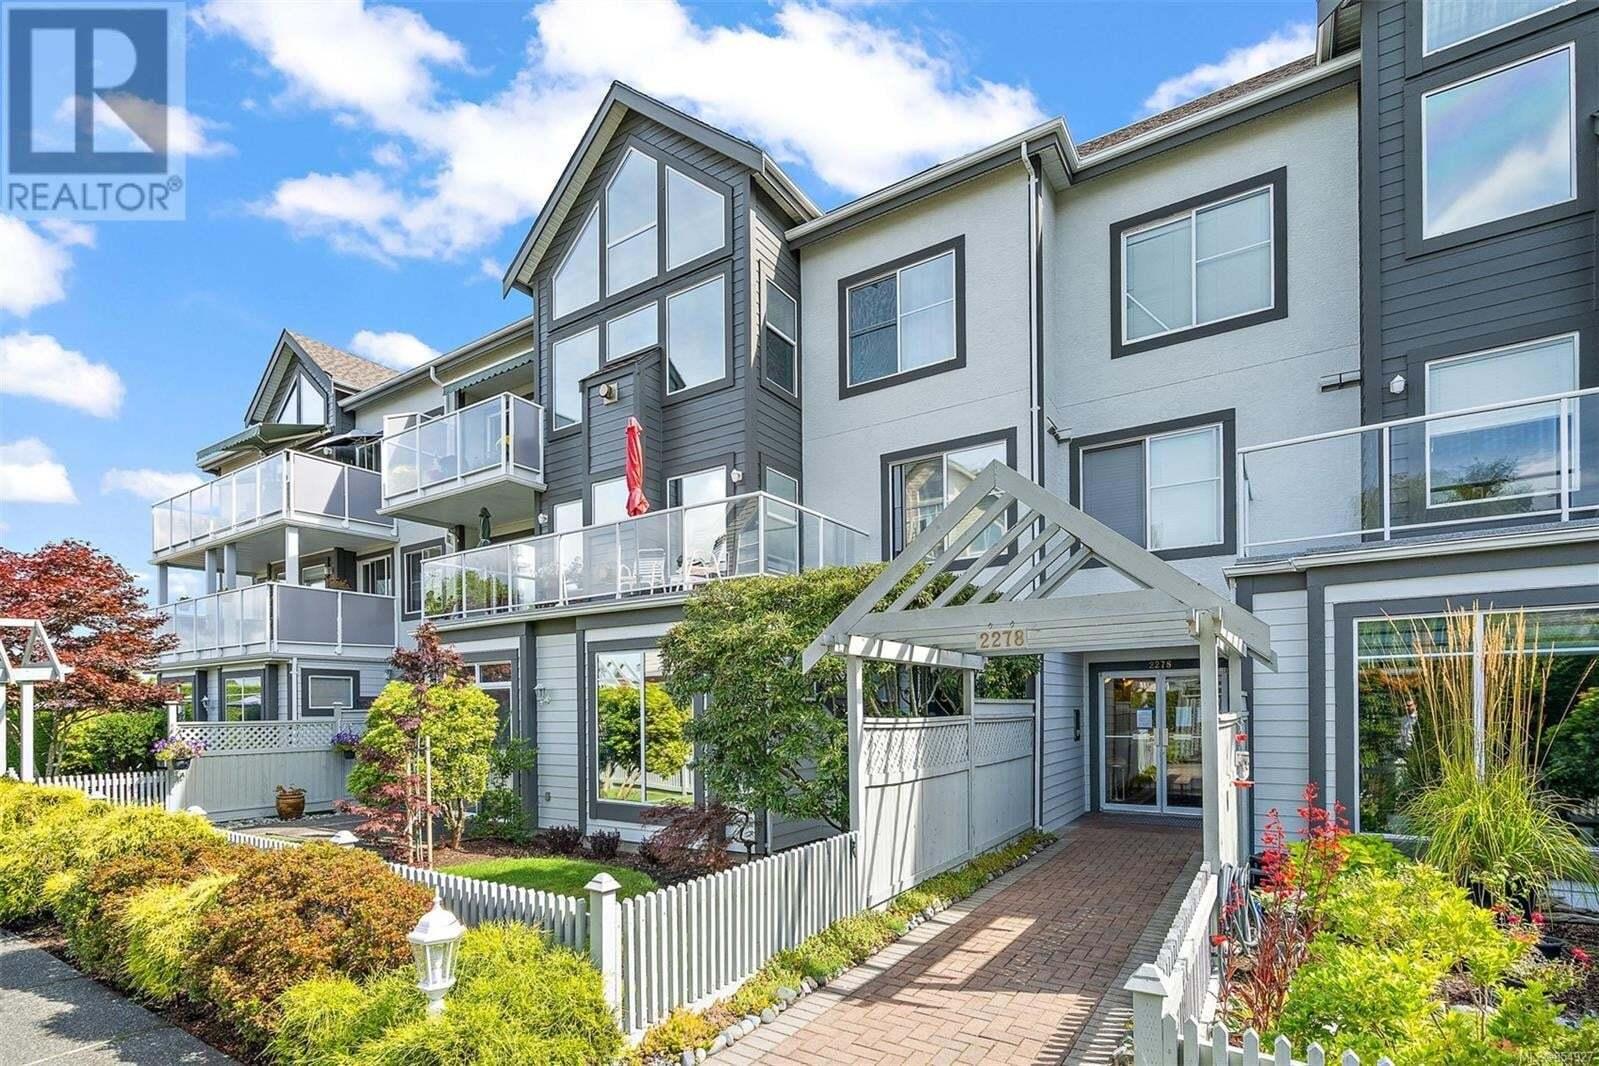 Condo for sale at 2278 James White Blvd Unit 307 Sidney British Columbia - MLS: 854927